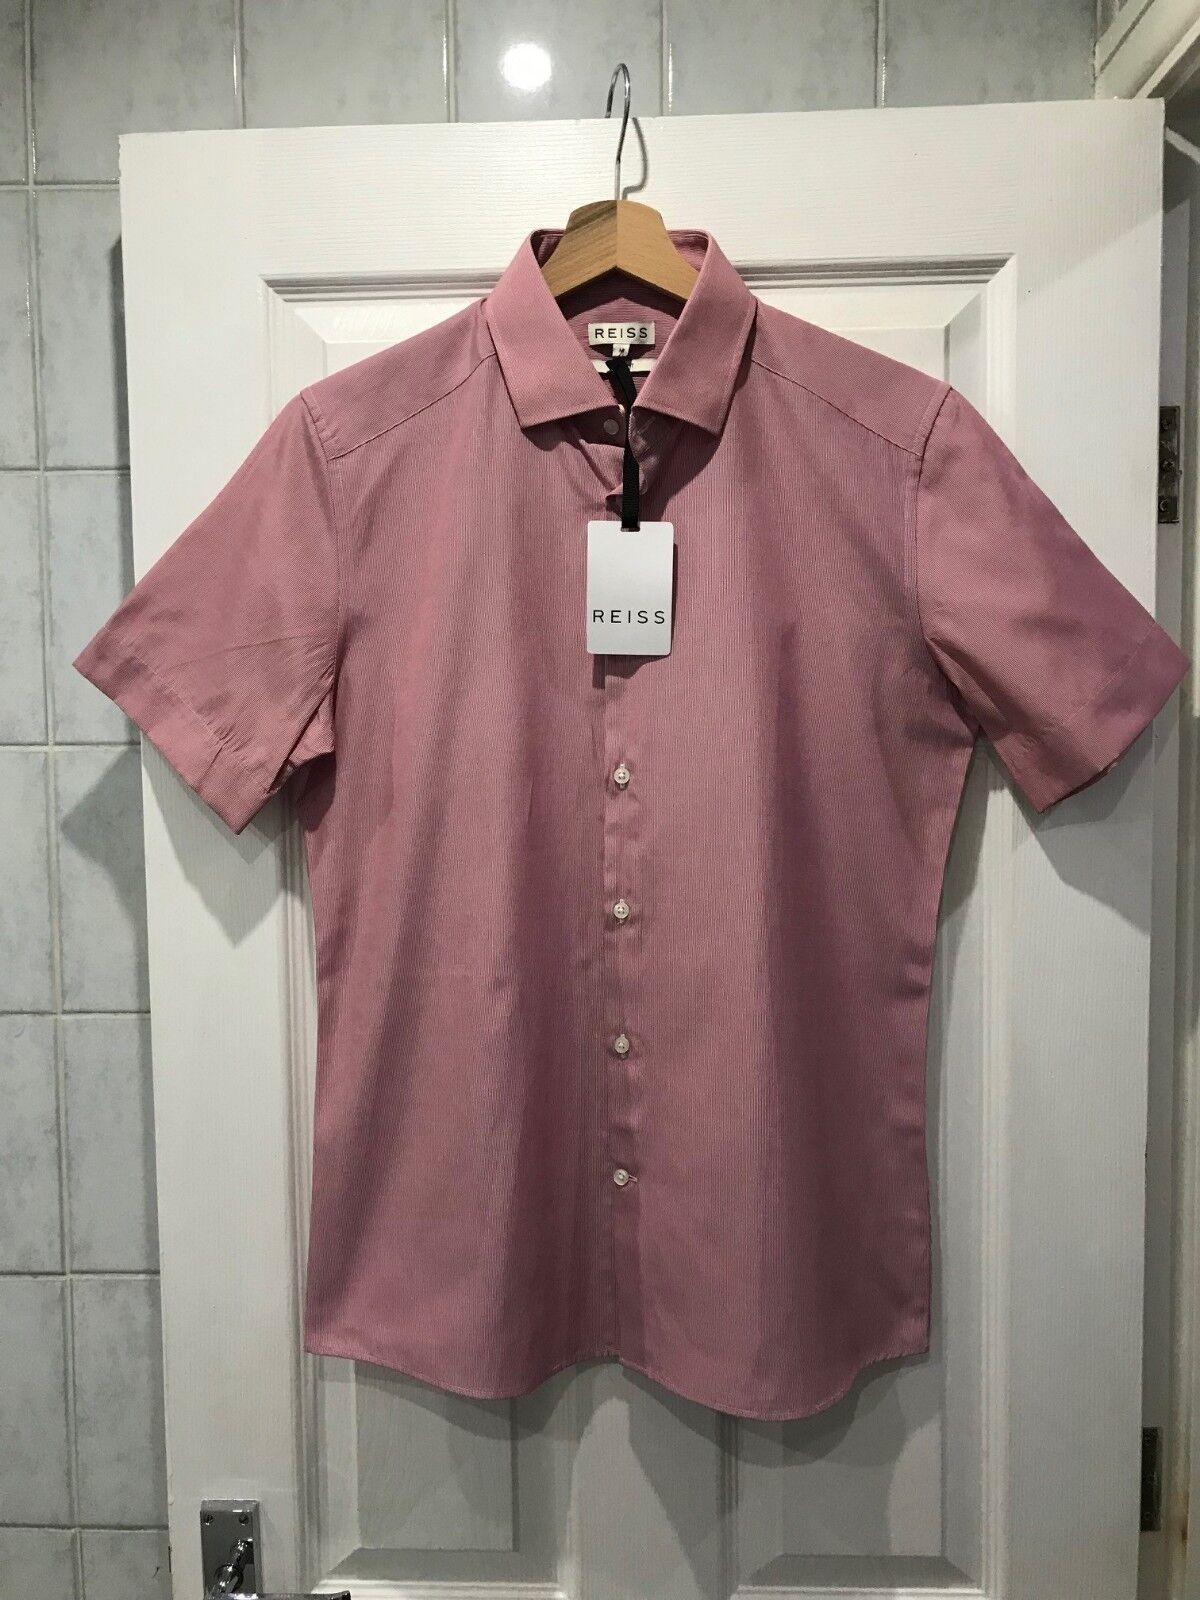 BNWT Reiss 'Payne' Short Sleeve Slim Fit Shirt Size  Medium RRP